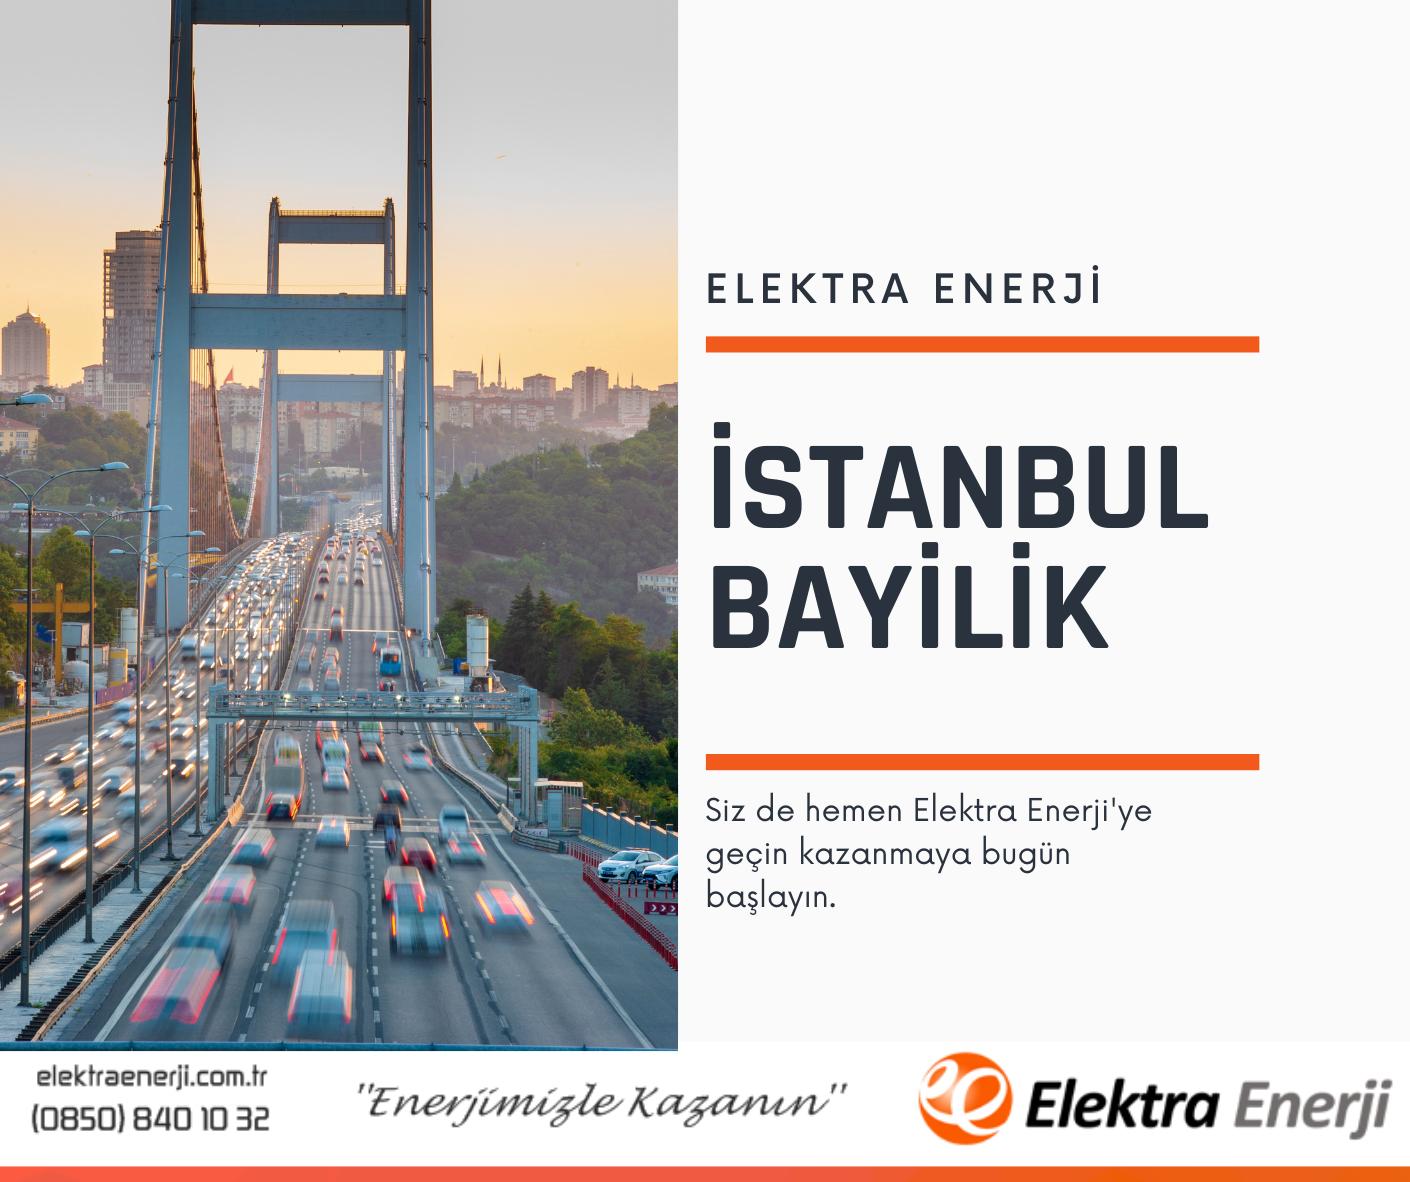 İstanbul Bayilik alma